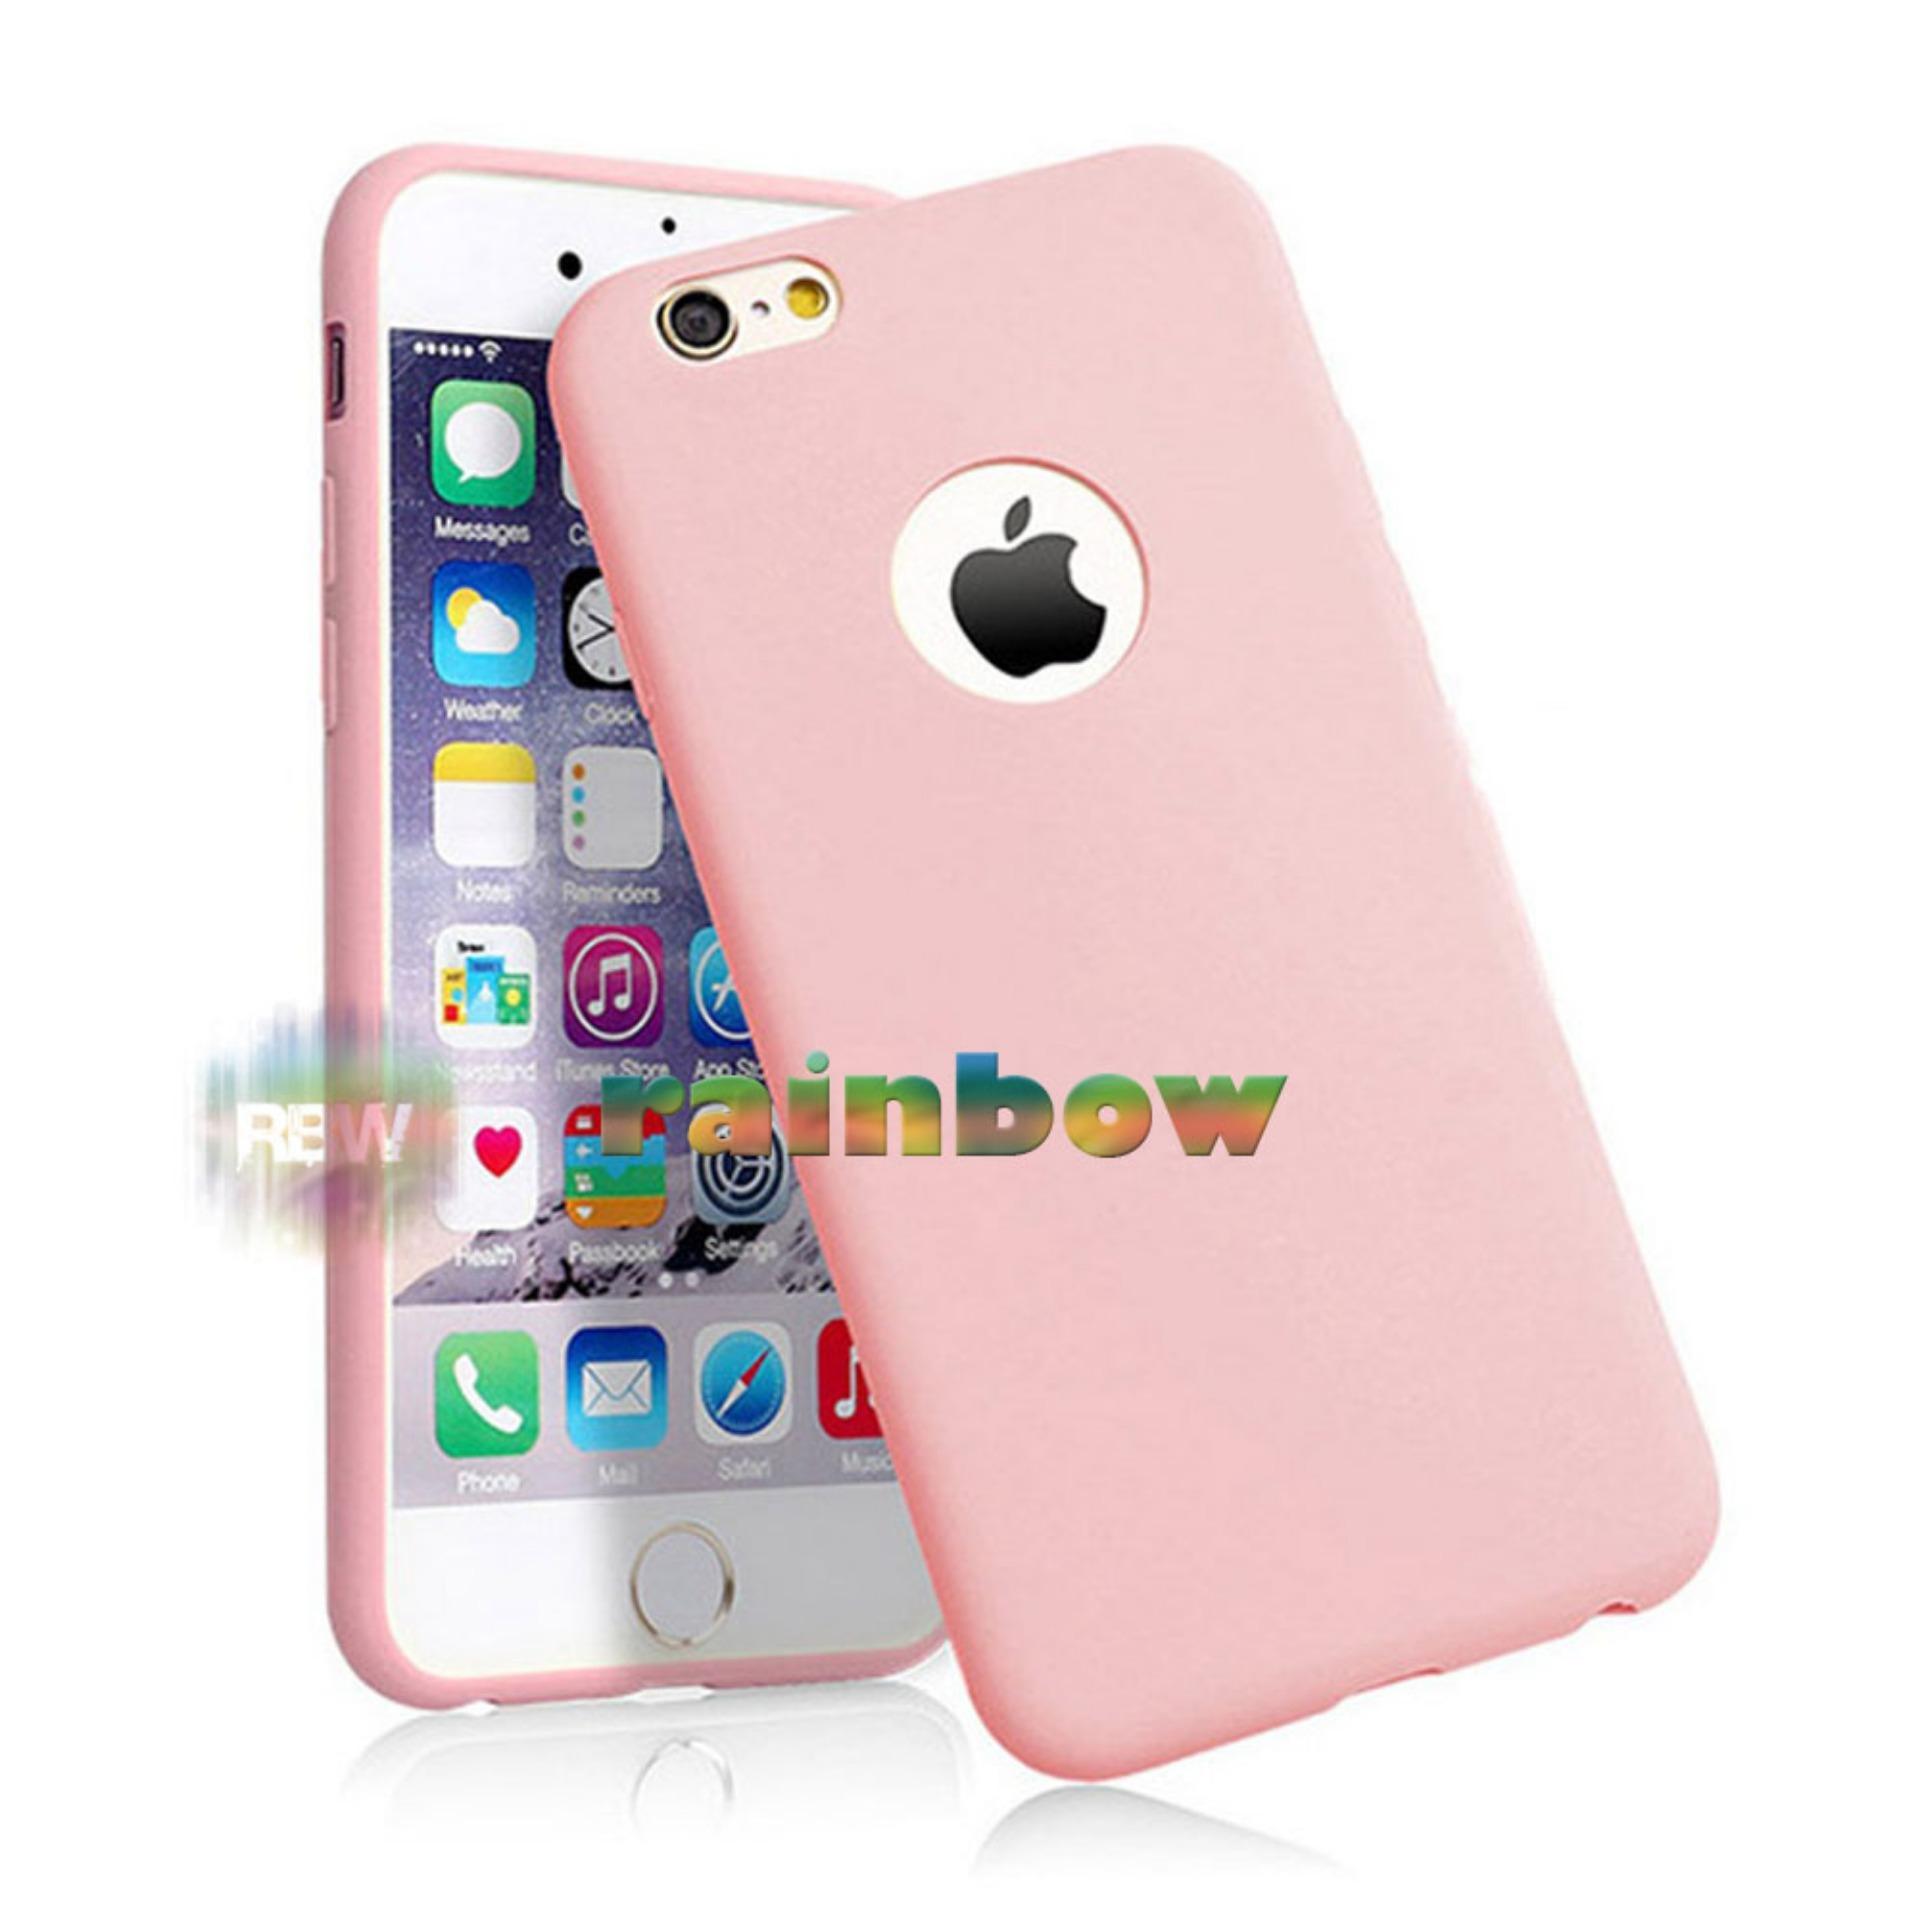 Lize Apple Iphone8 Plus / Iphone 8 Plus Ukuran 5.5 inch Softshell / Jelly Case / Soft Case Iphone 8+ / Soft Back Case / Silicone Iphone8 Plus / Silicon / Silikon / Case Iphone / Casing iPhone 8+ / Casing Handphone Iphone 8+ - Pink